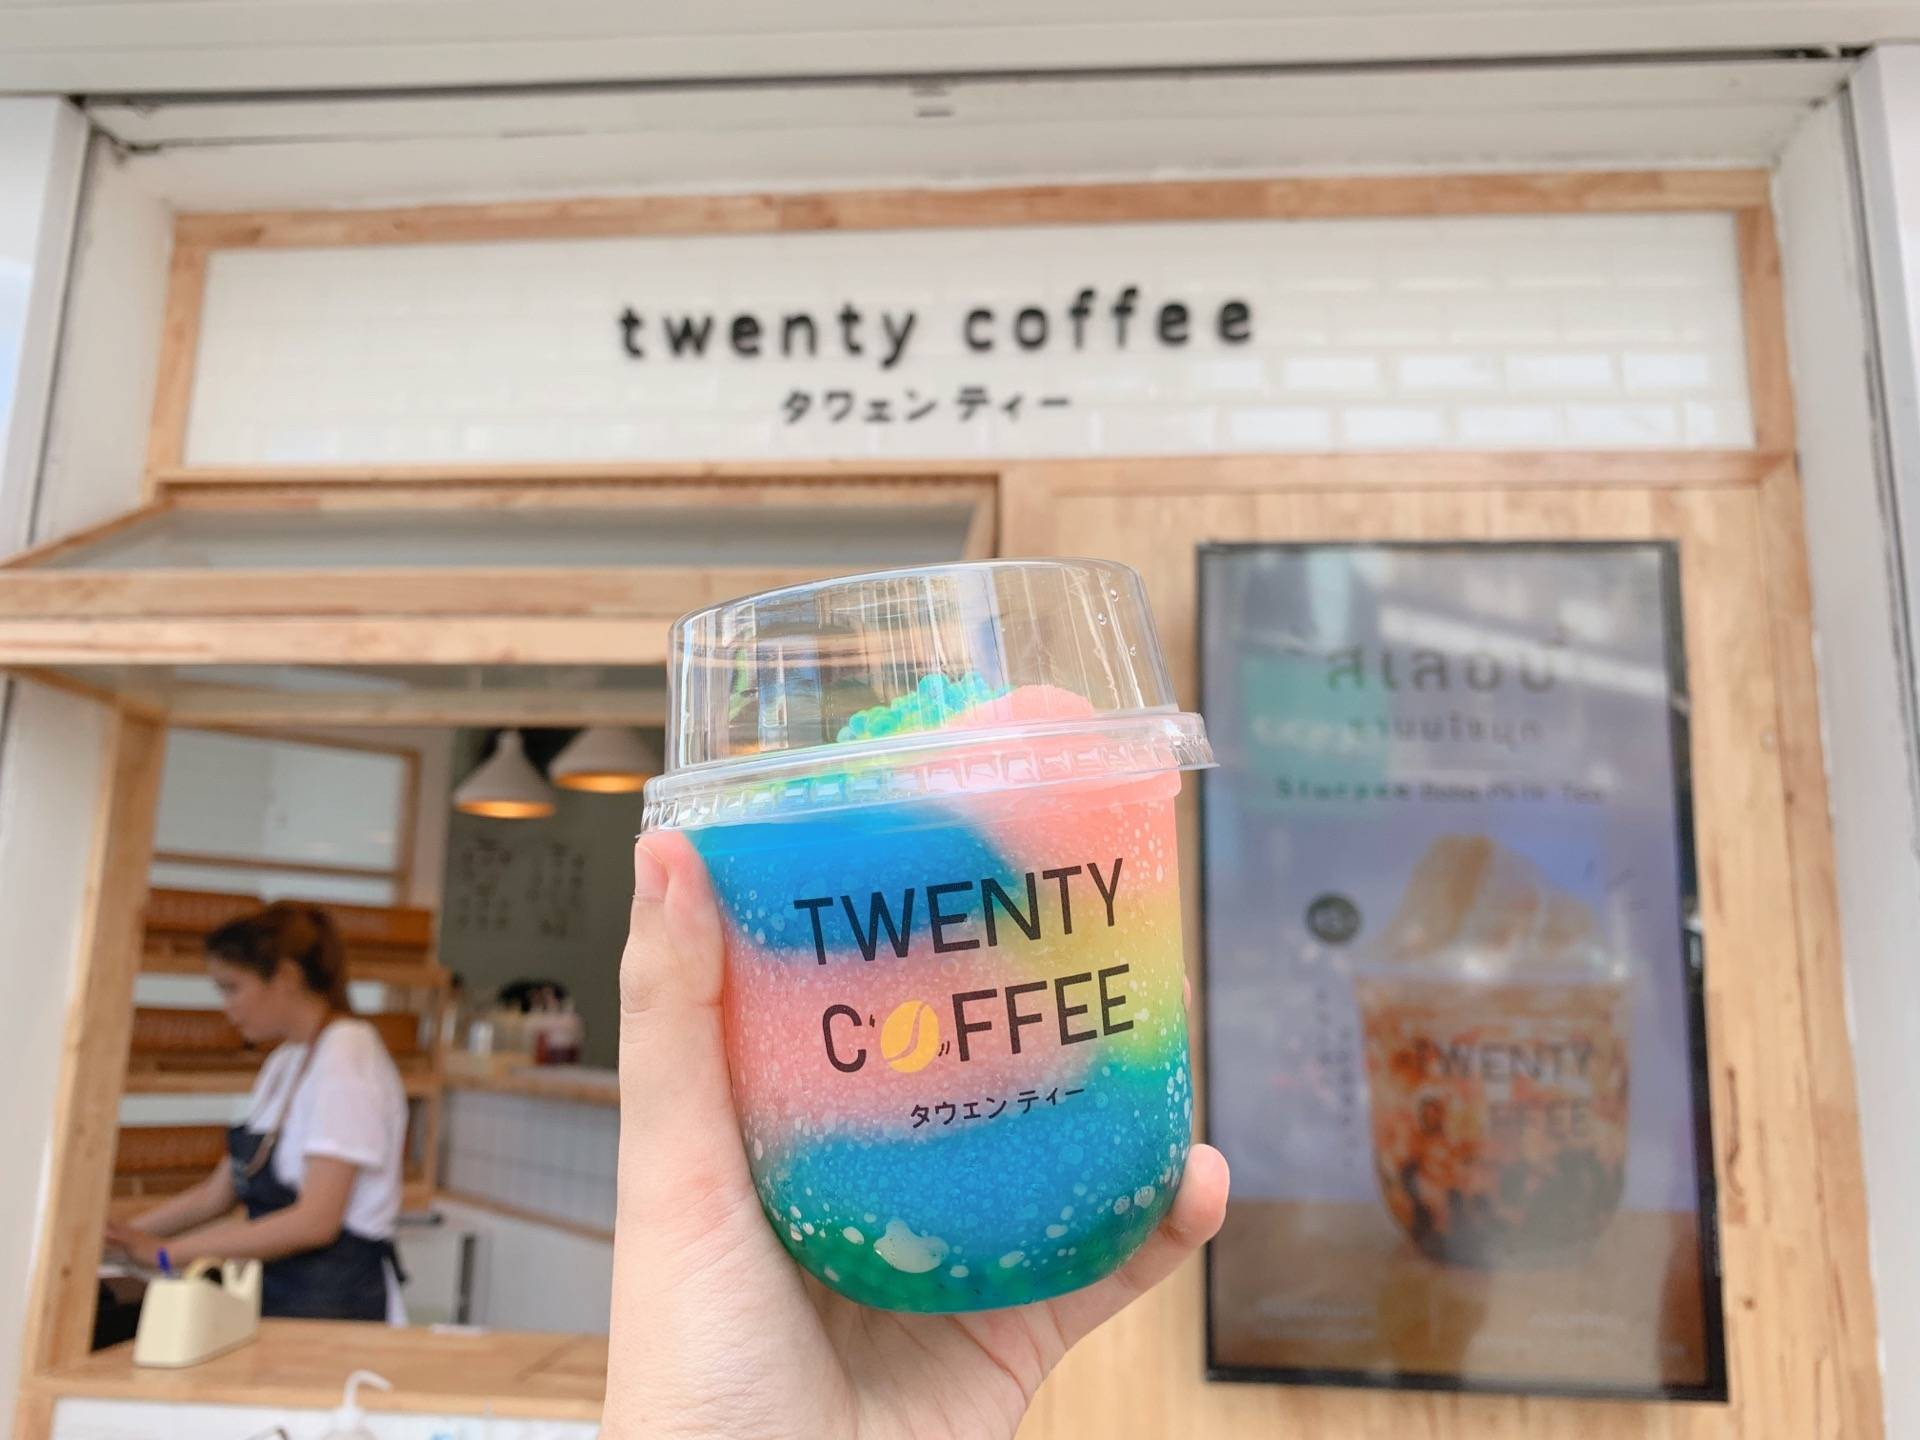 Twenty Coffee